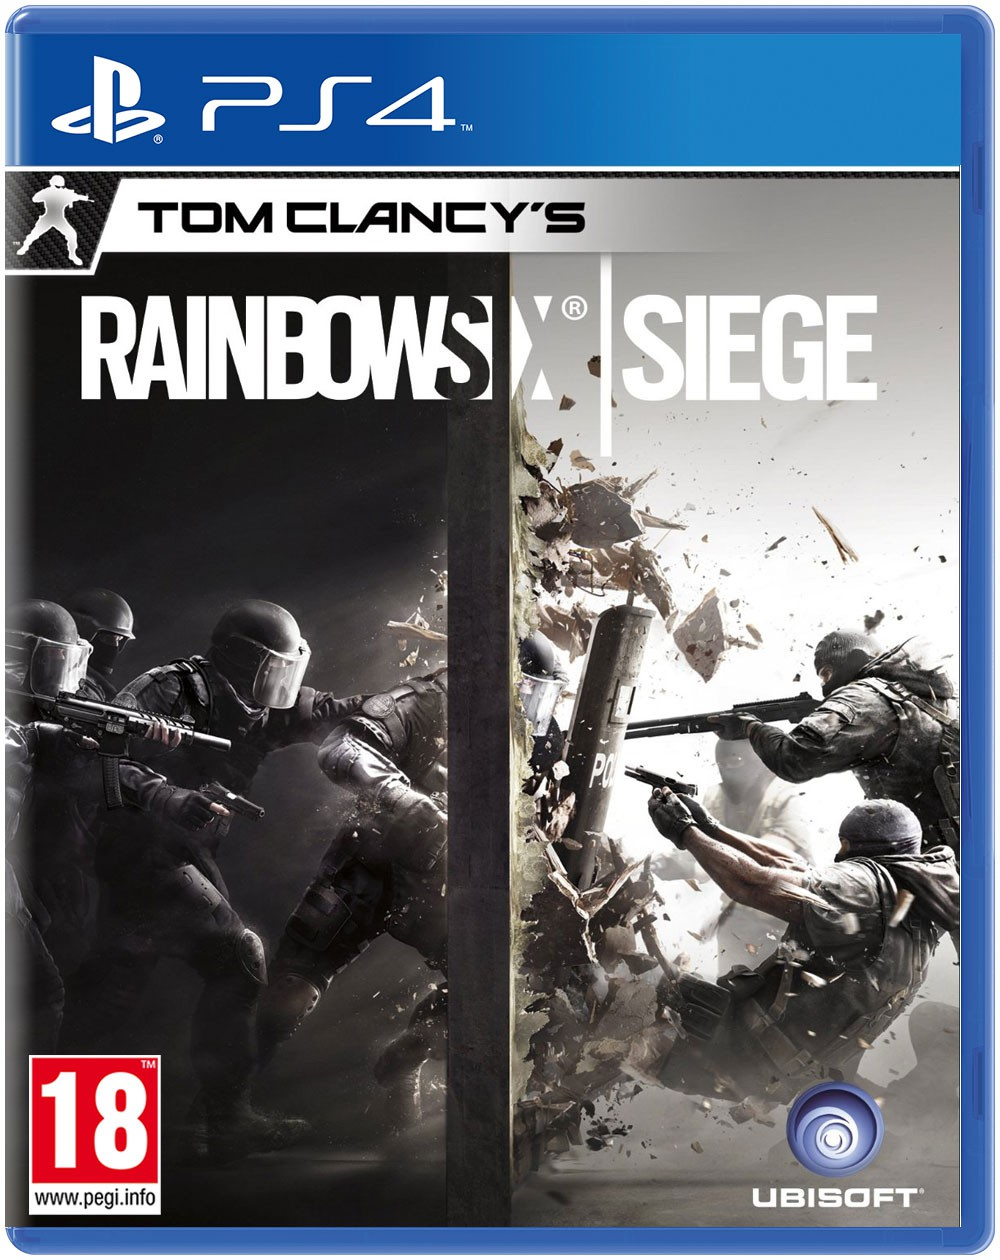 PS4 GAME - Tom Clancy's Rainbow Six Siege